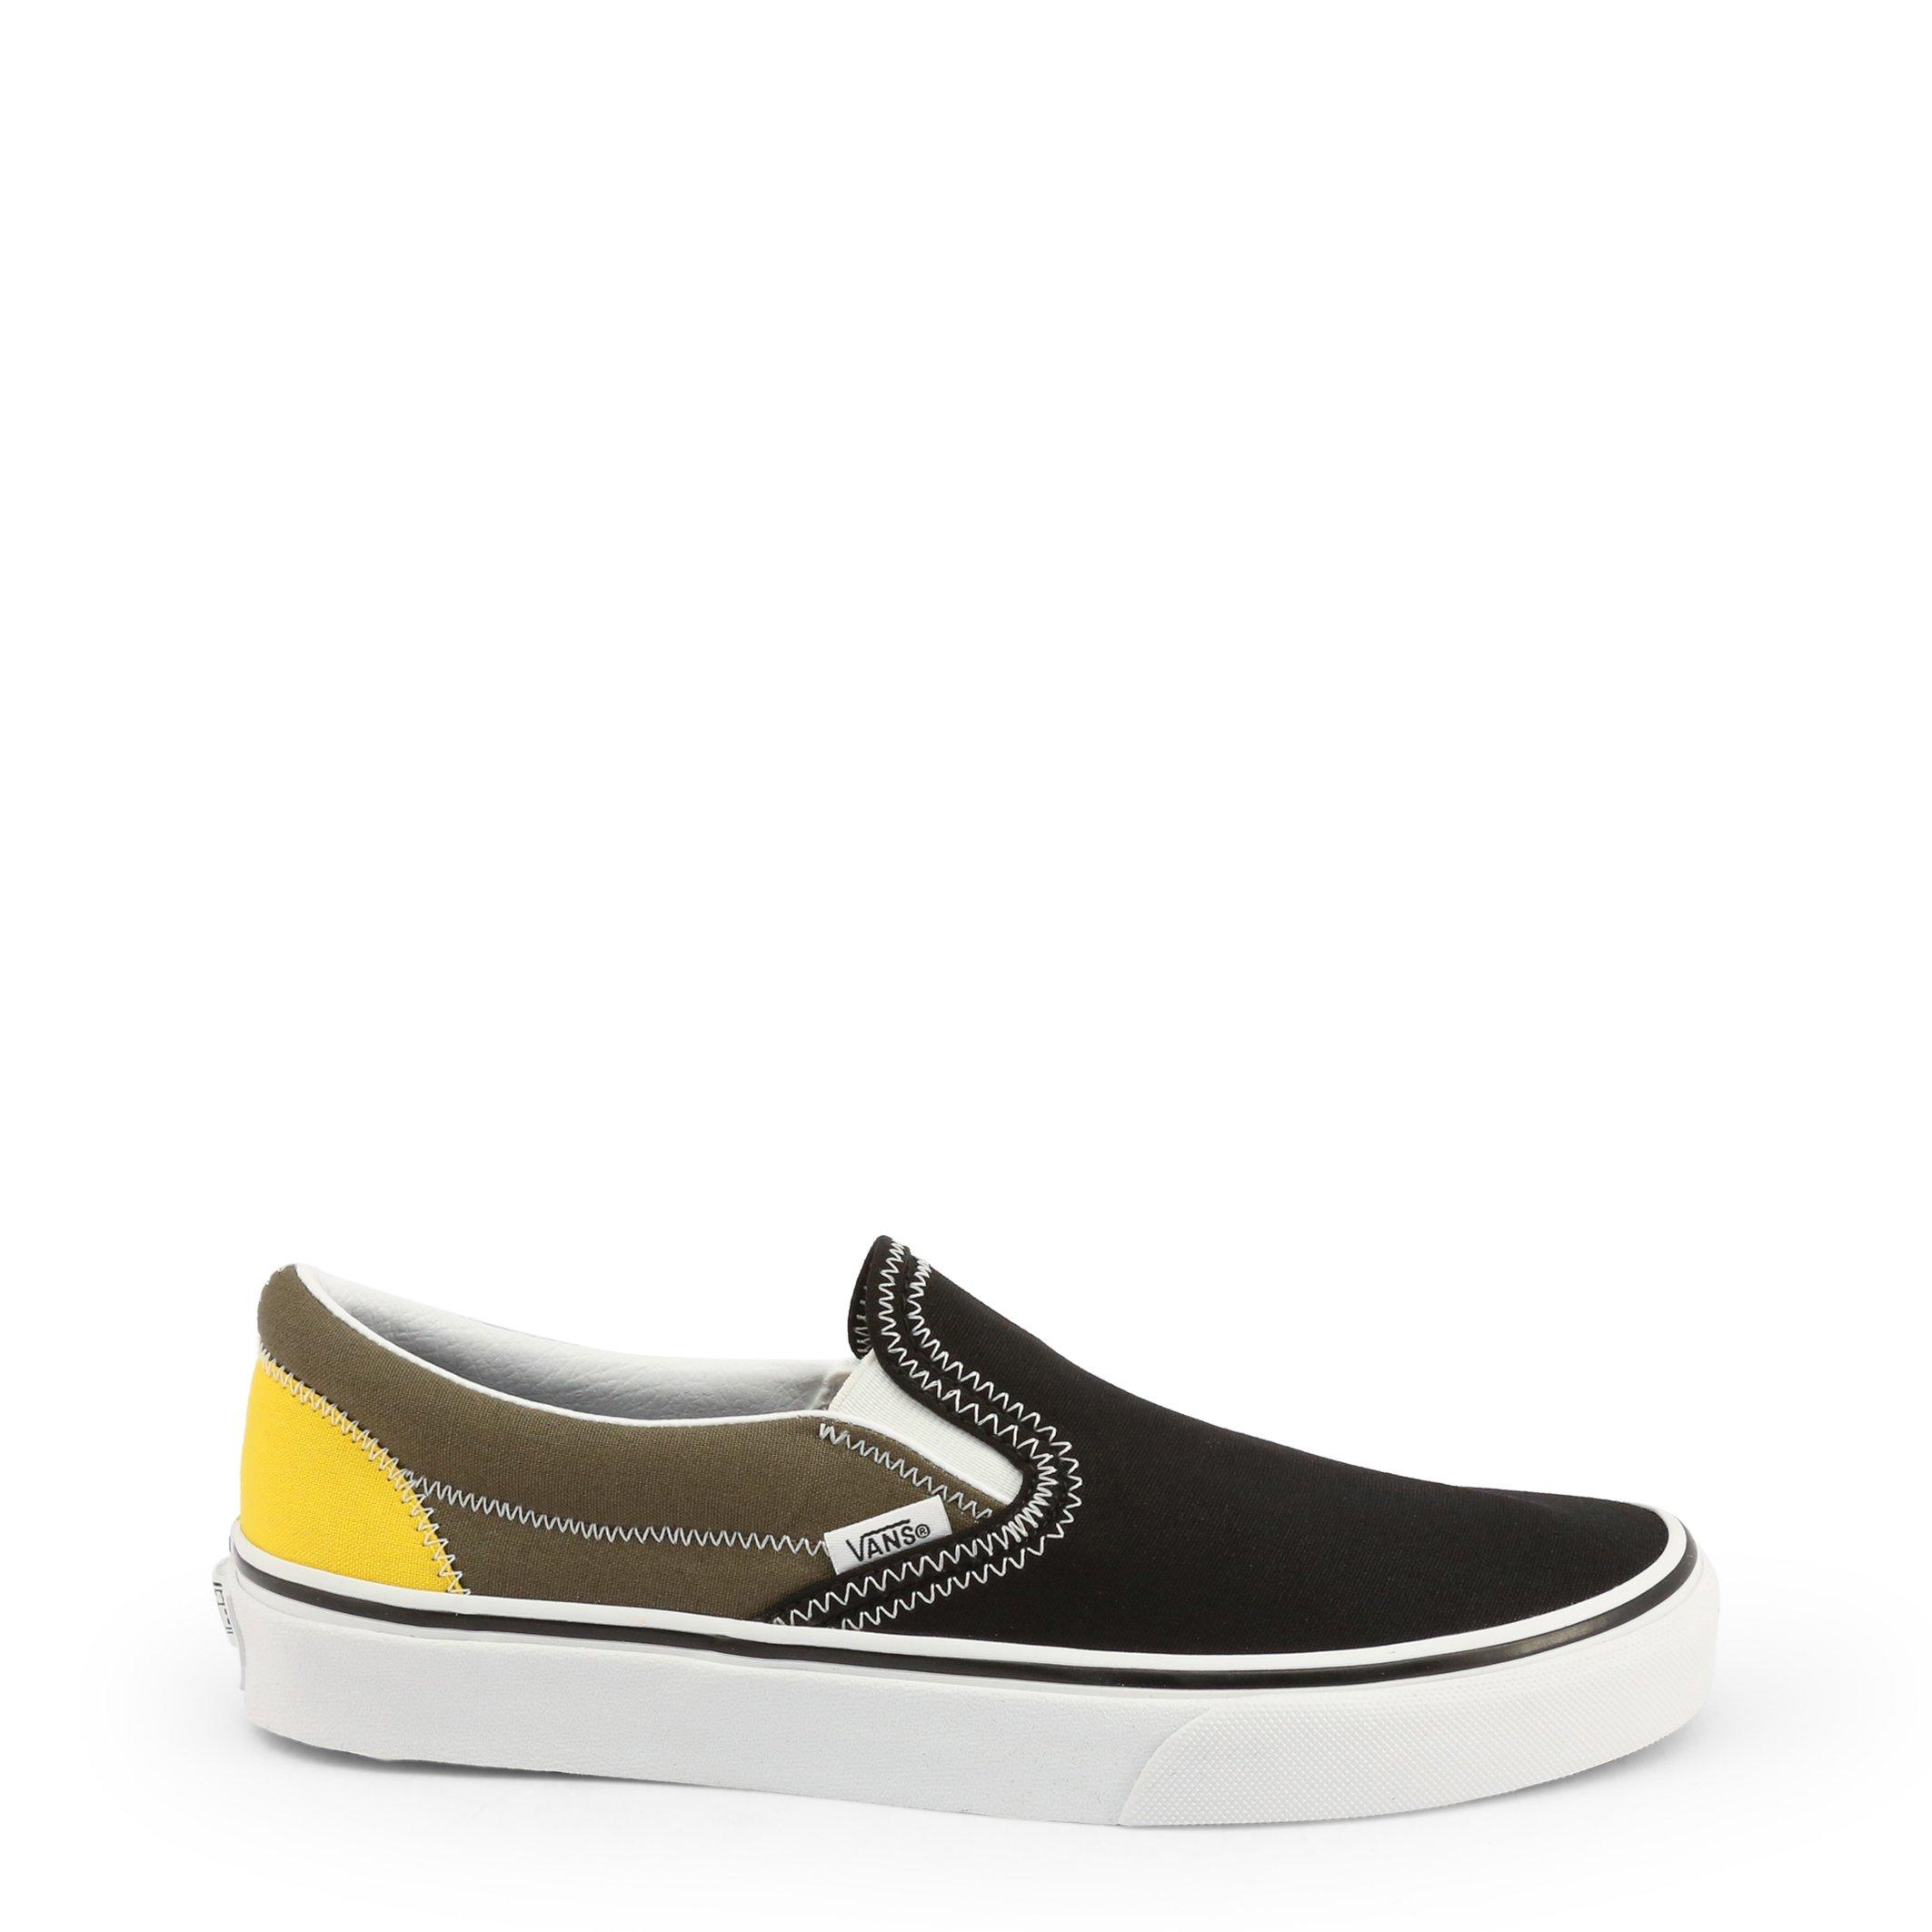 Vans Unisex Slip On Shoe Black CLASSIC-SLIP-ON_VN0A4U38 - black-1 US 5